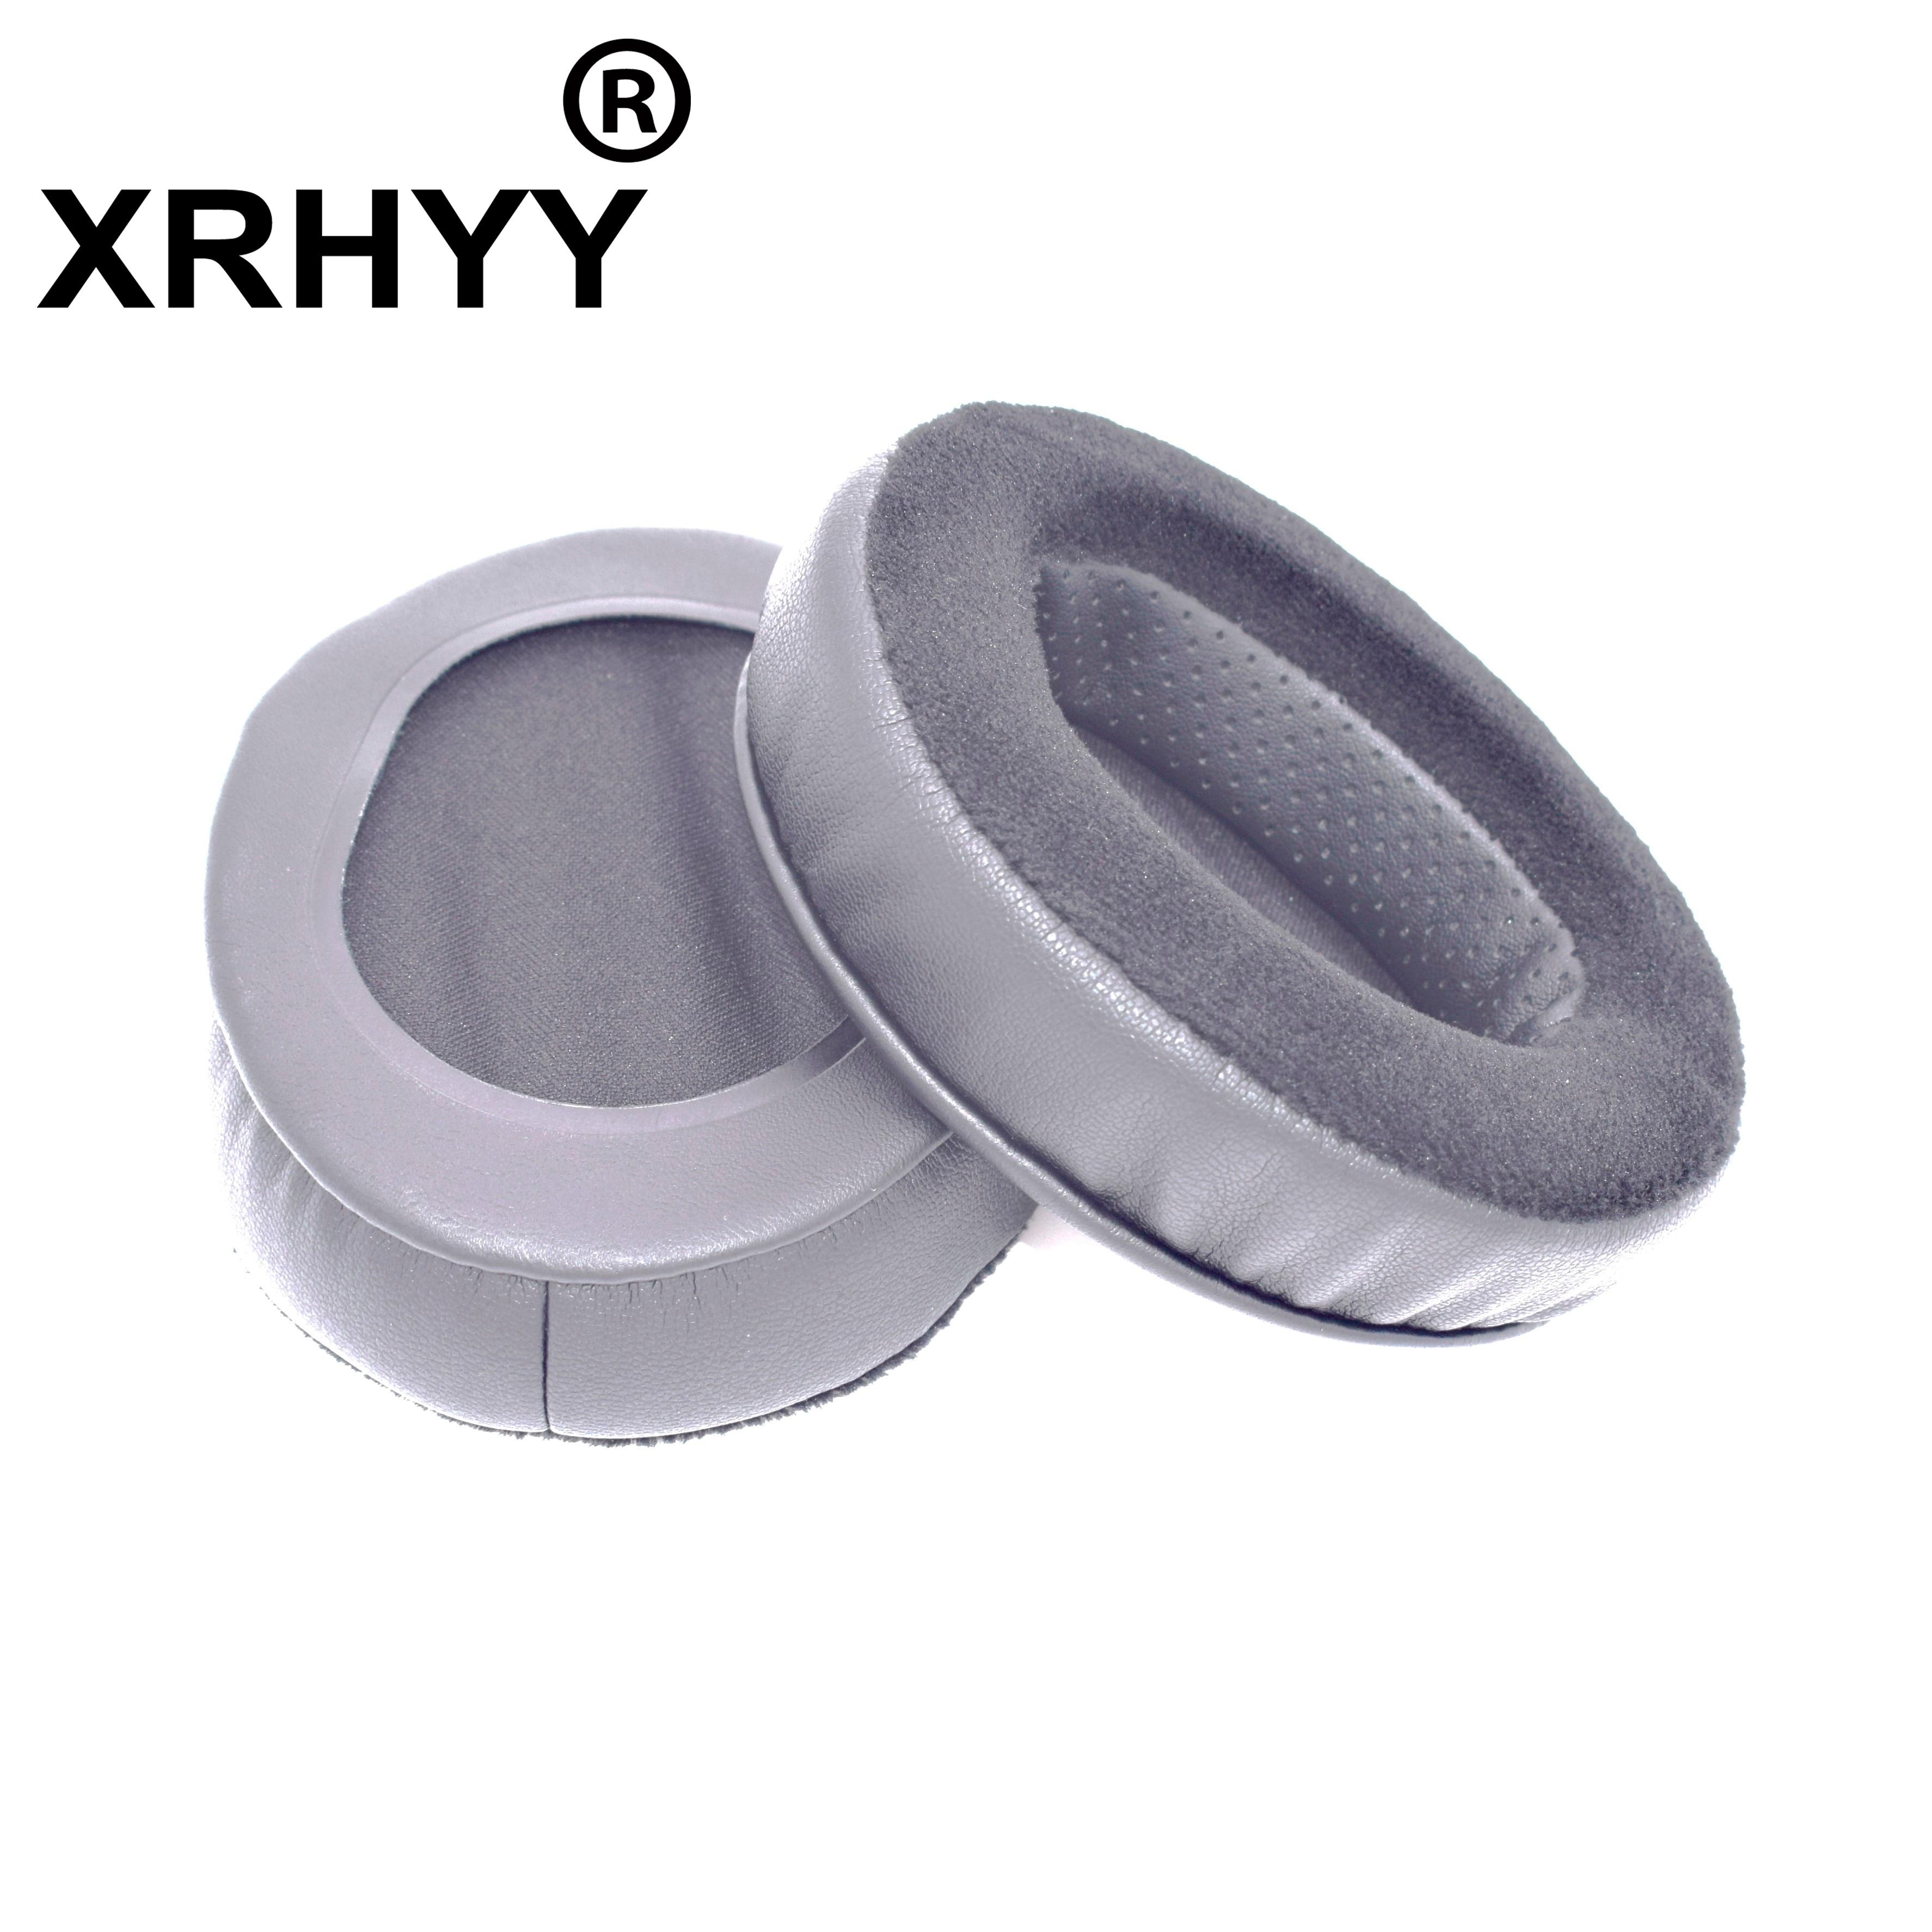 XRHYY Memory Foam Earpad - Black PU/Velour - Suitable For Large Over The Ear Brainwavz Hybrid Headphones